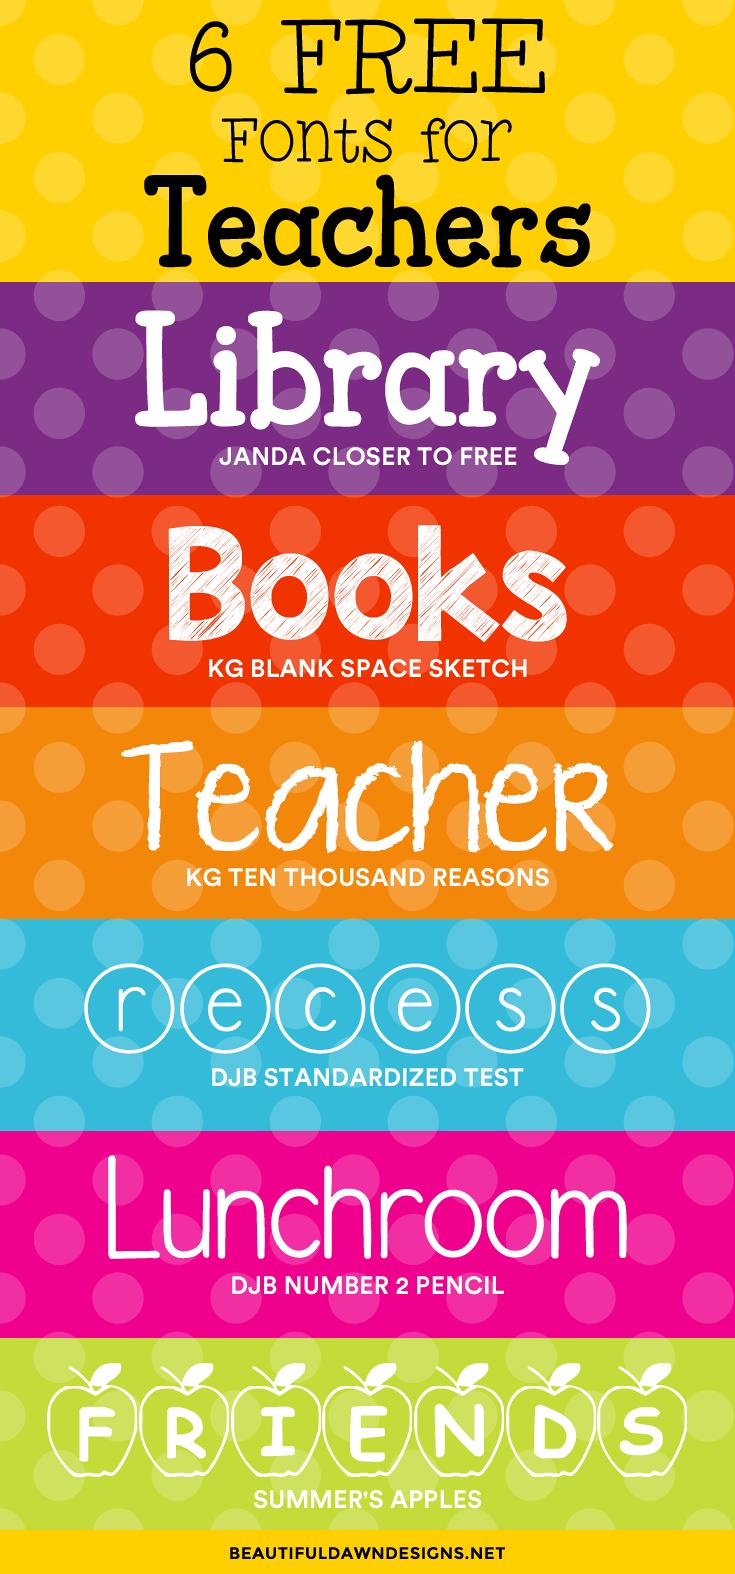 6 free fonts for teachers